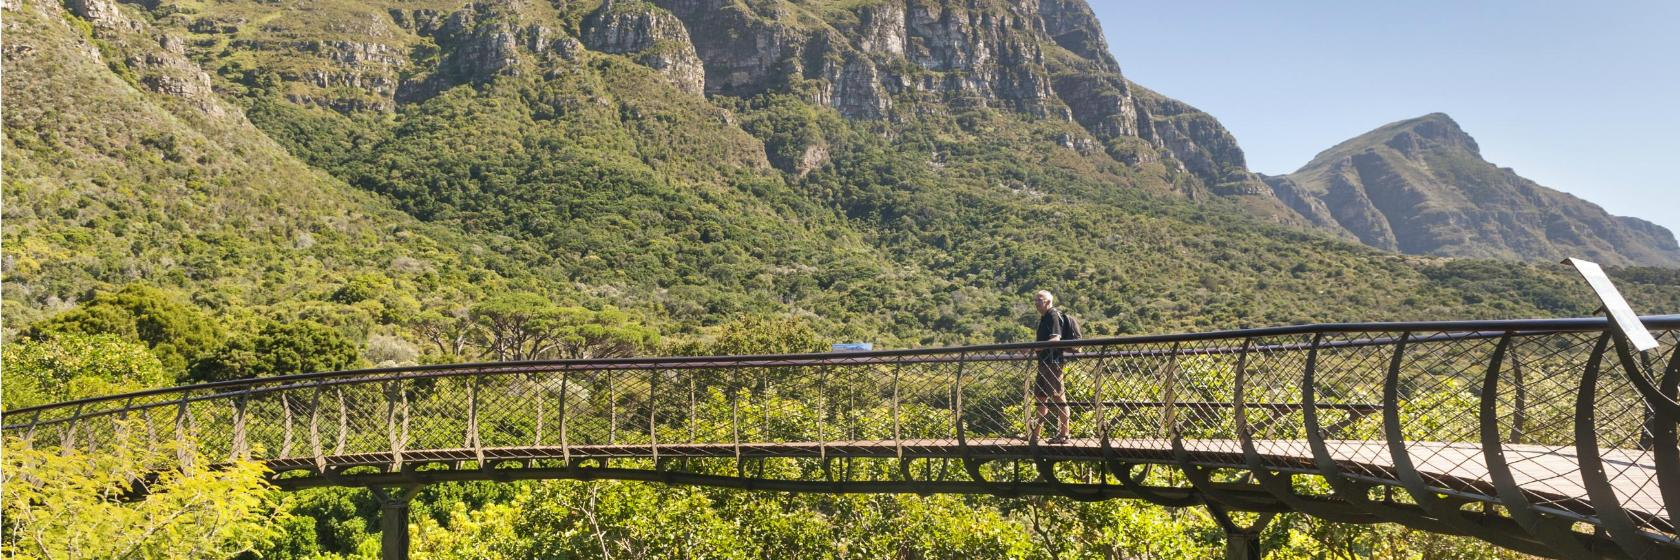 Kirstenbosch Gardens - Nature The Cape Town Big Five